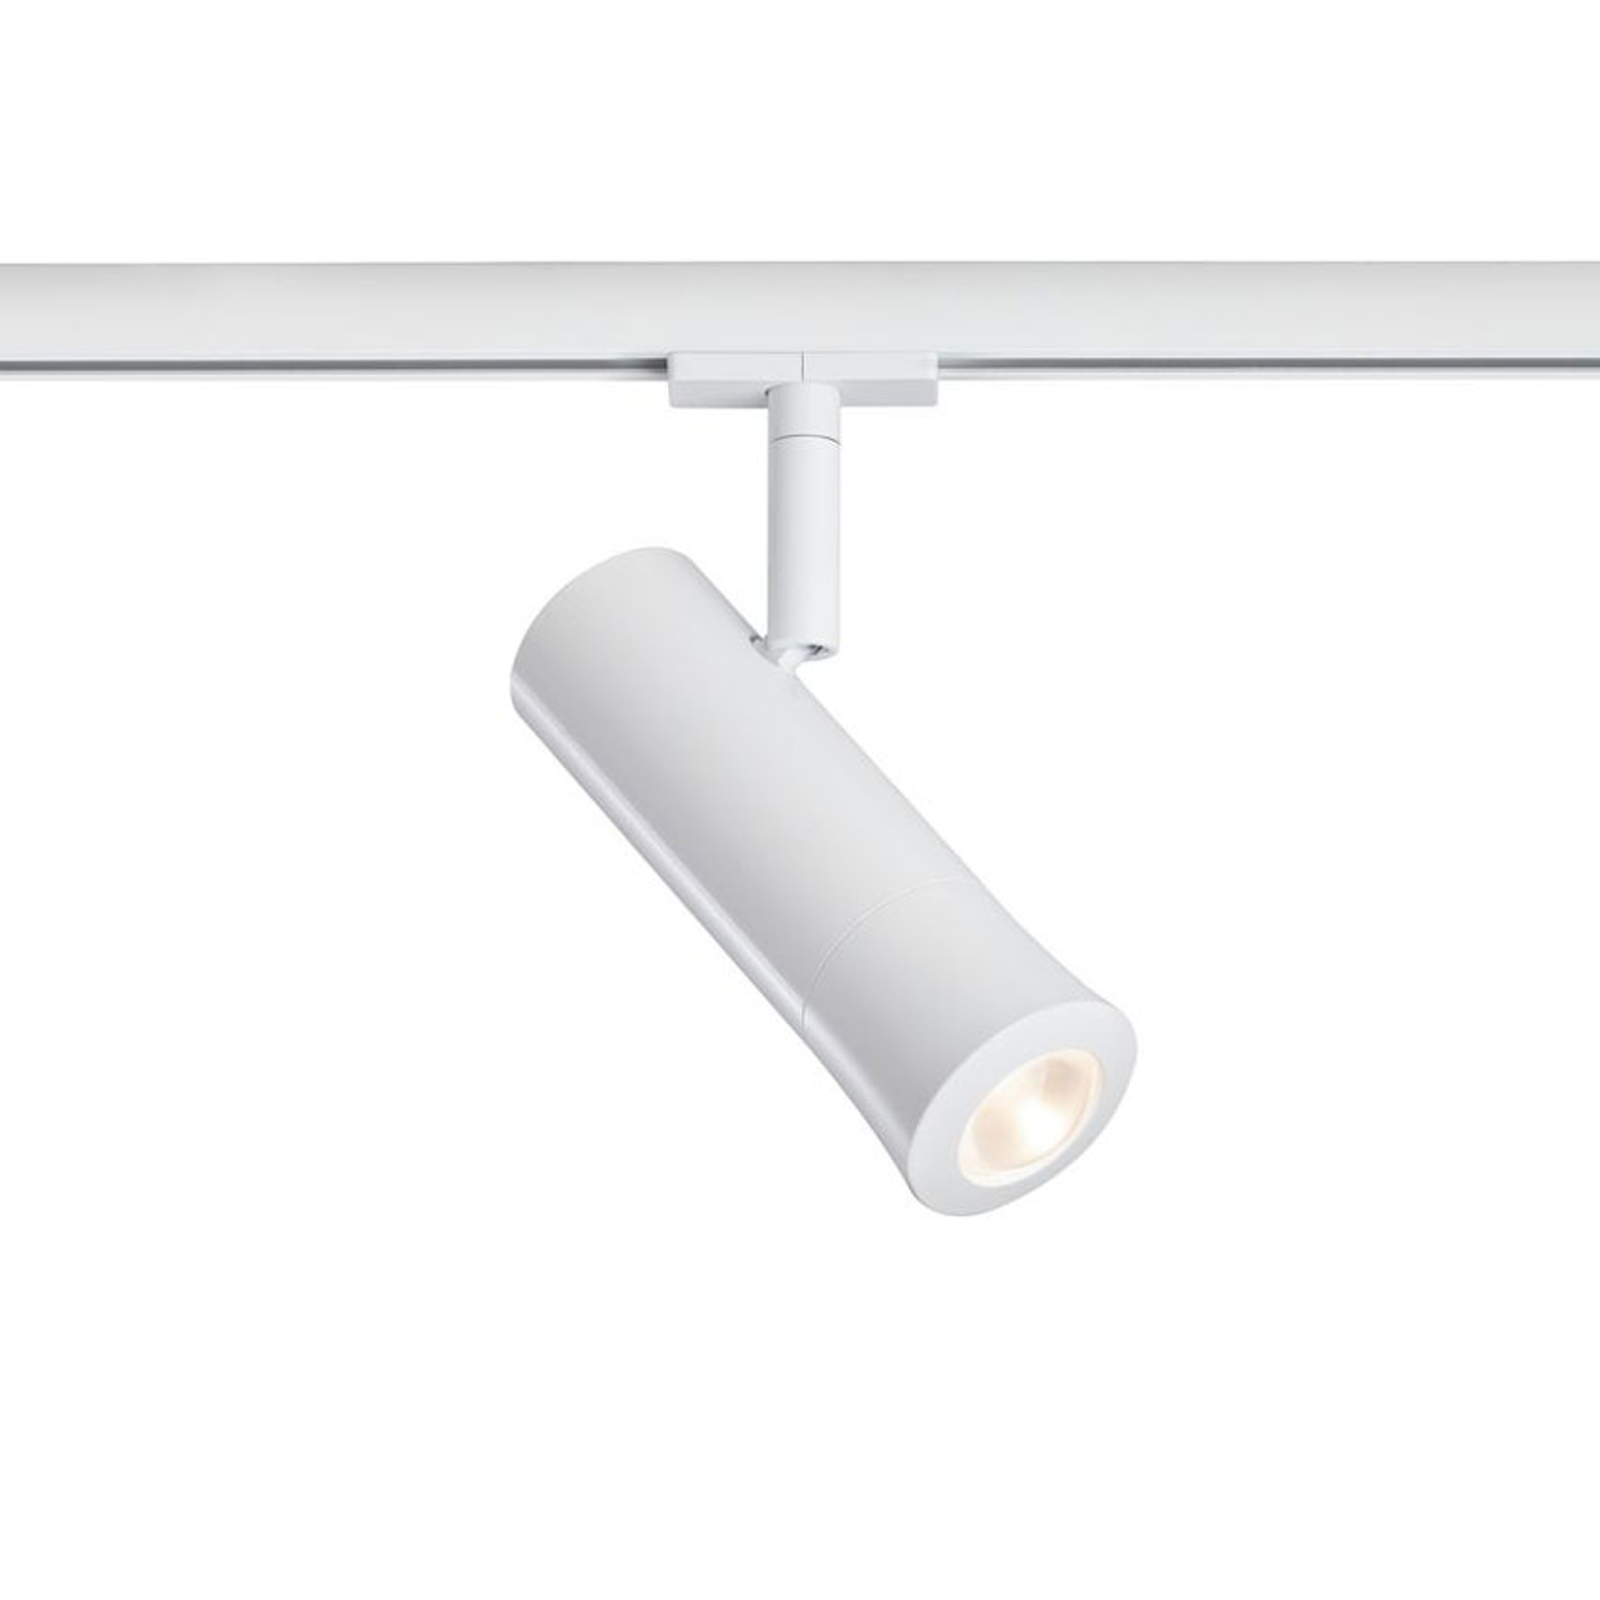 Dove acquistare Paulmann NanoRail Tarus spot LED, bianco